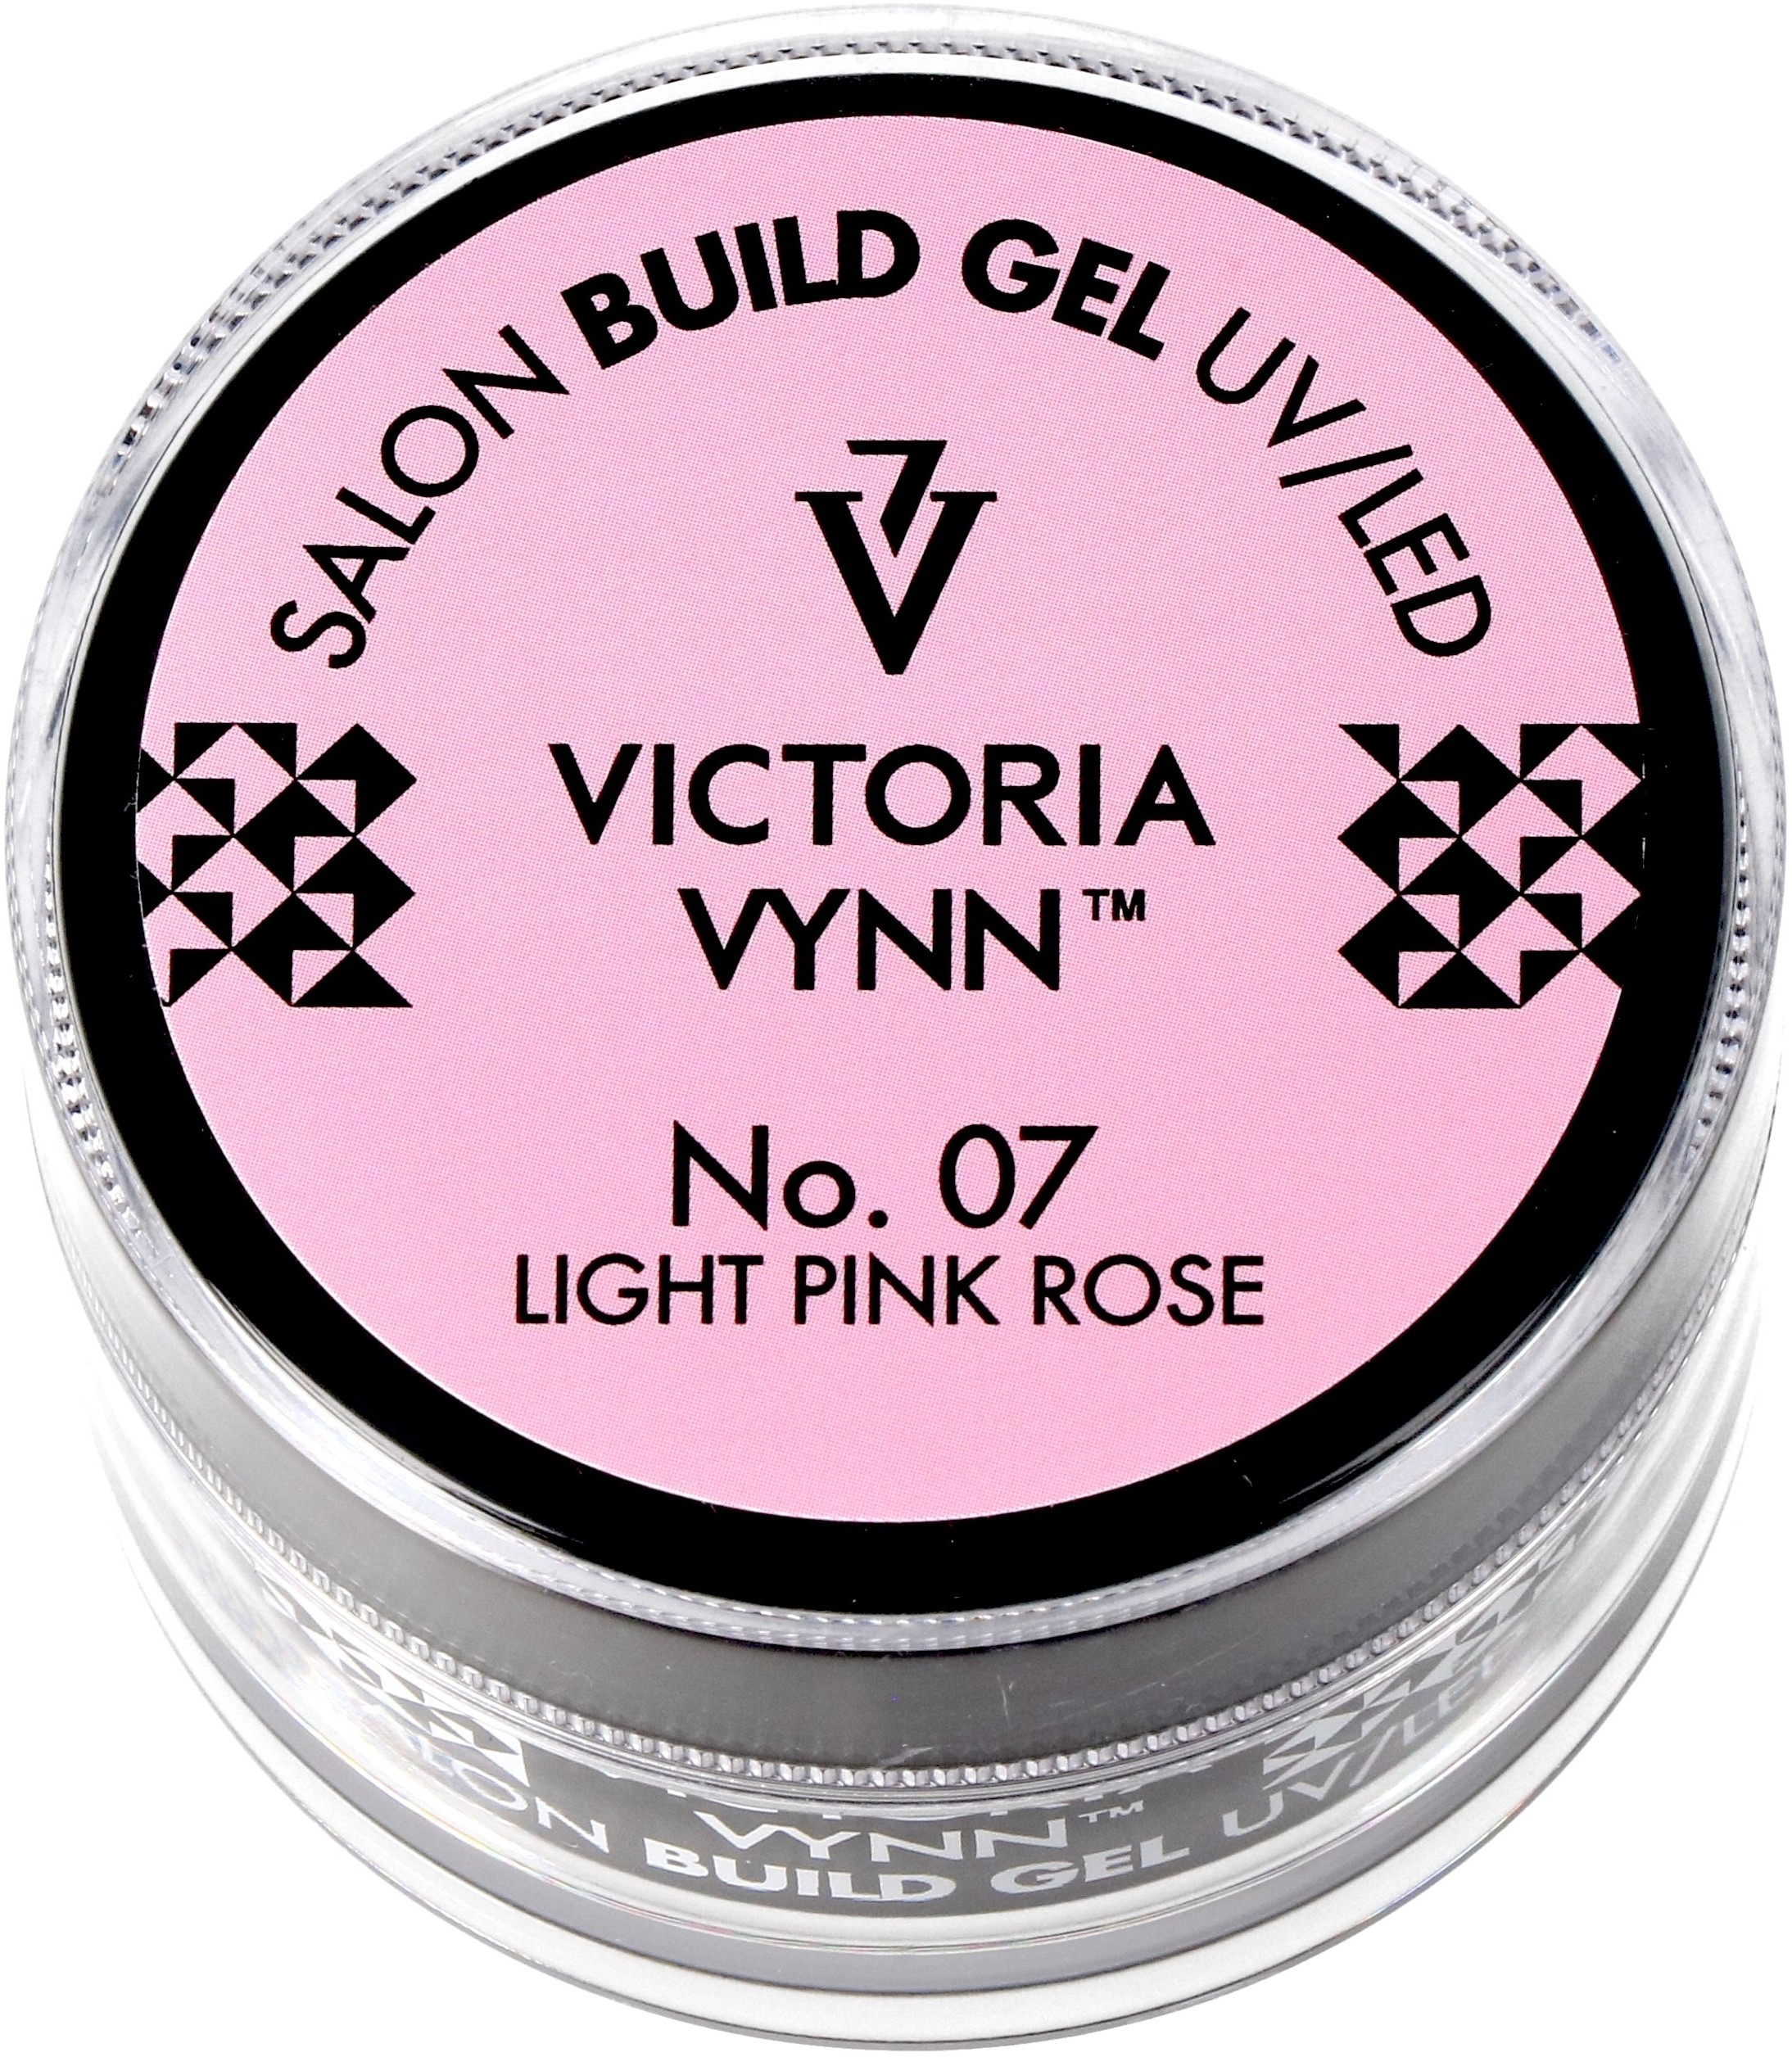 Victoria Vynn Żel budujący Light Pink Rose No.007 - SALON BUILD GEL - 15 ml